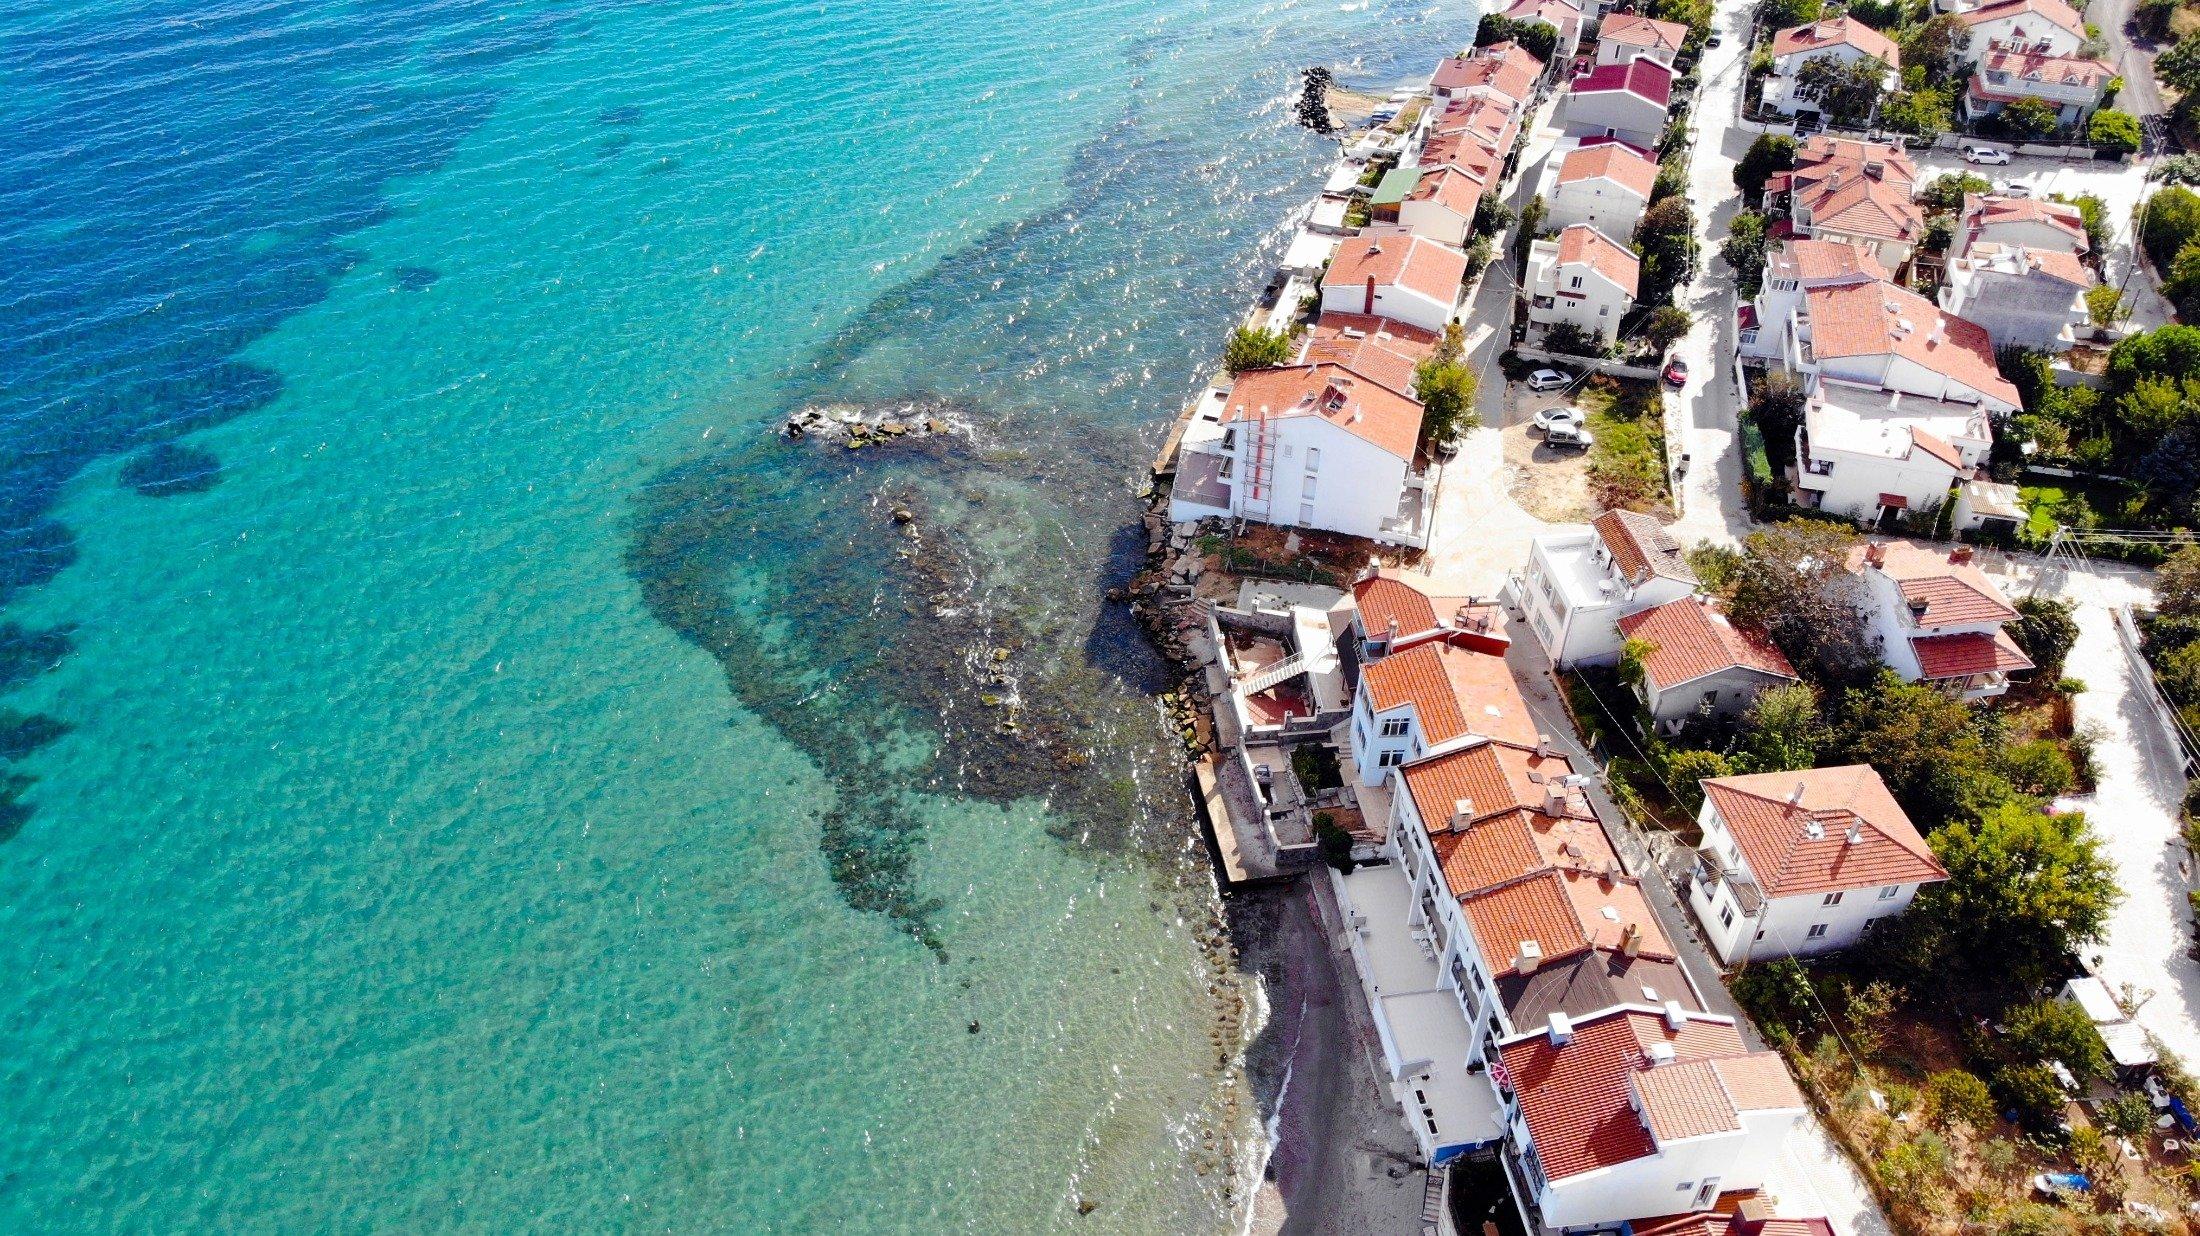 The crystal clear water of the Marmara Sea rests on the coastline ofTekirdağ, Turkey. (Shutterstock Photo)